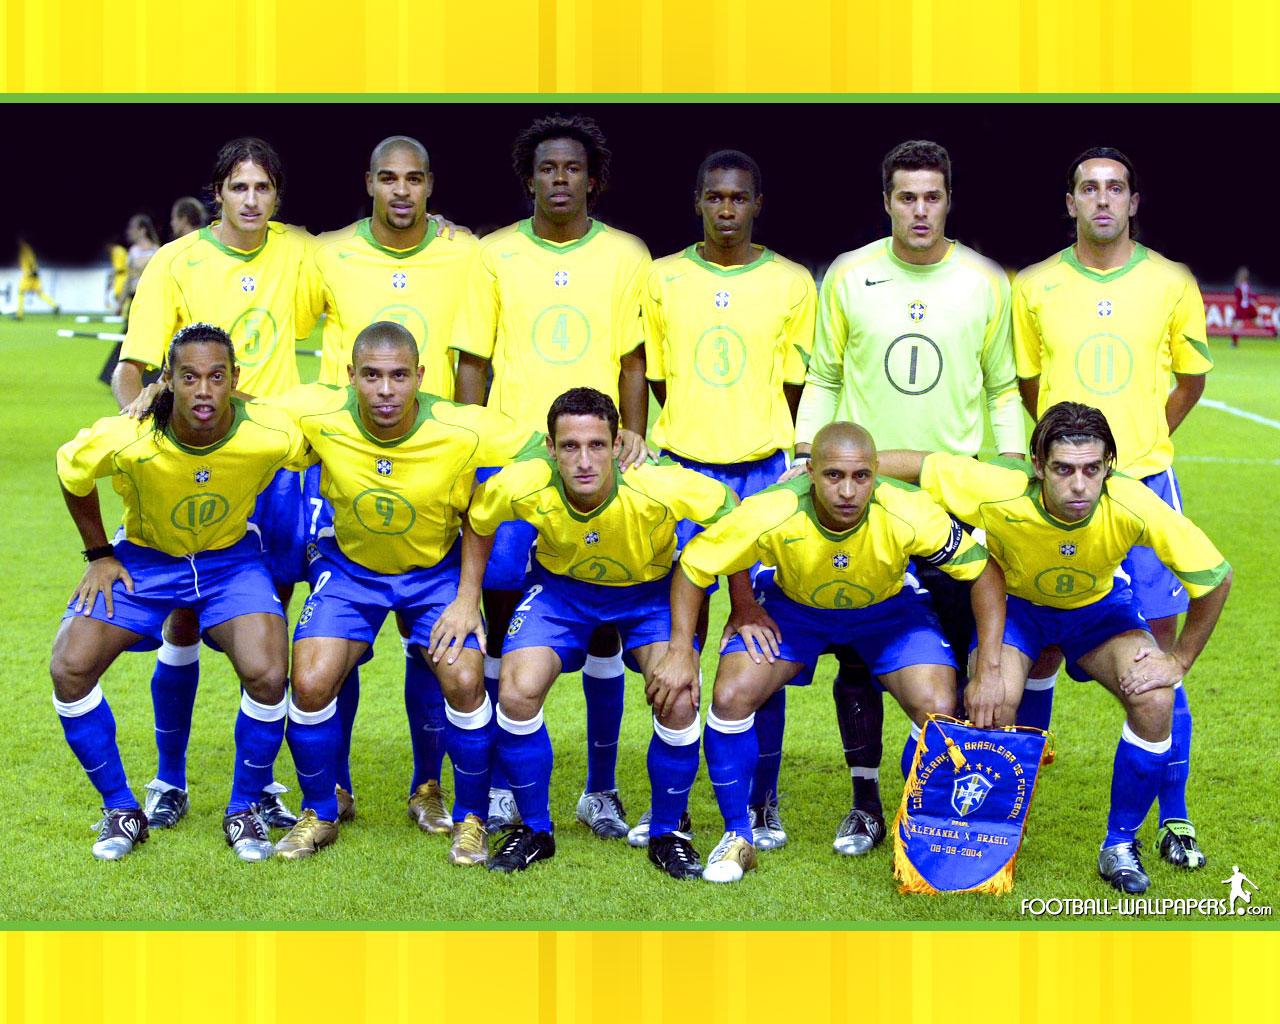 fa1e0677206 BRAZIL's NATIONAL SOCCER TEAM - Marlon Morgan's blog